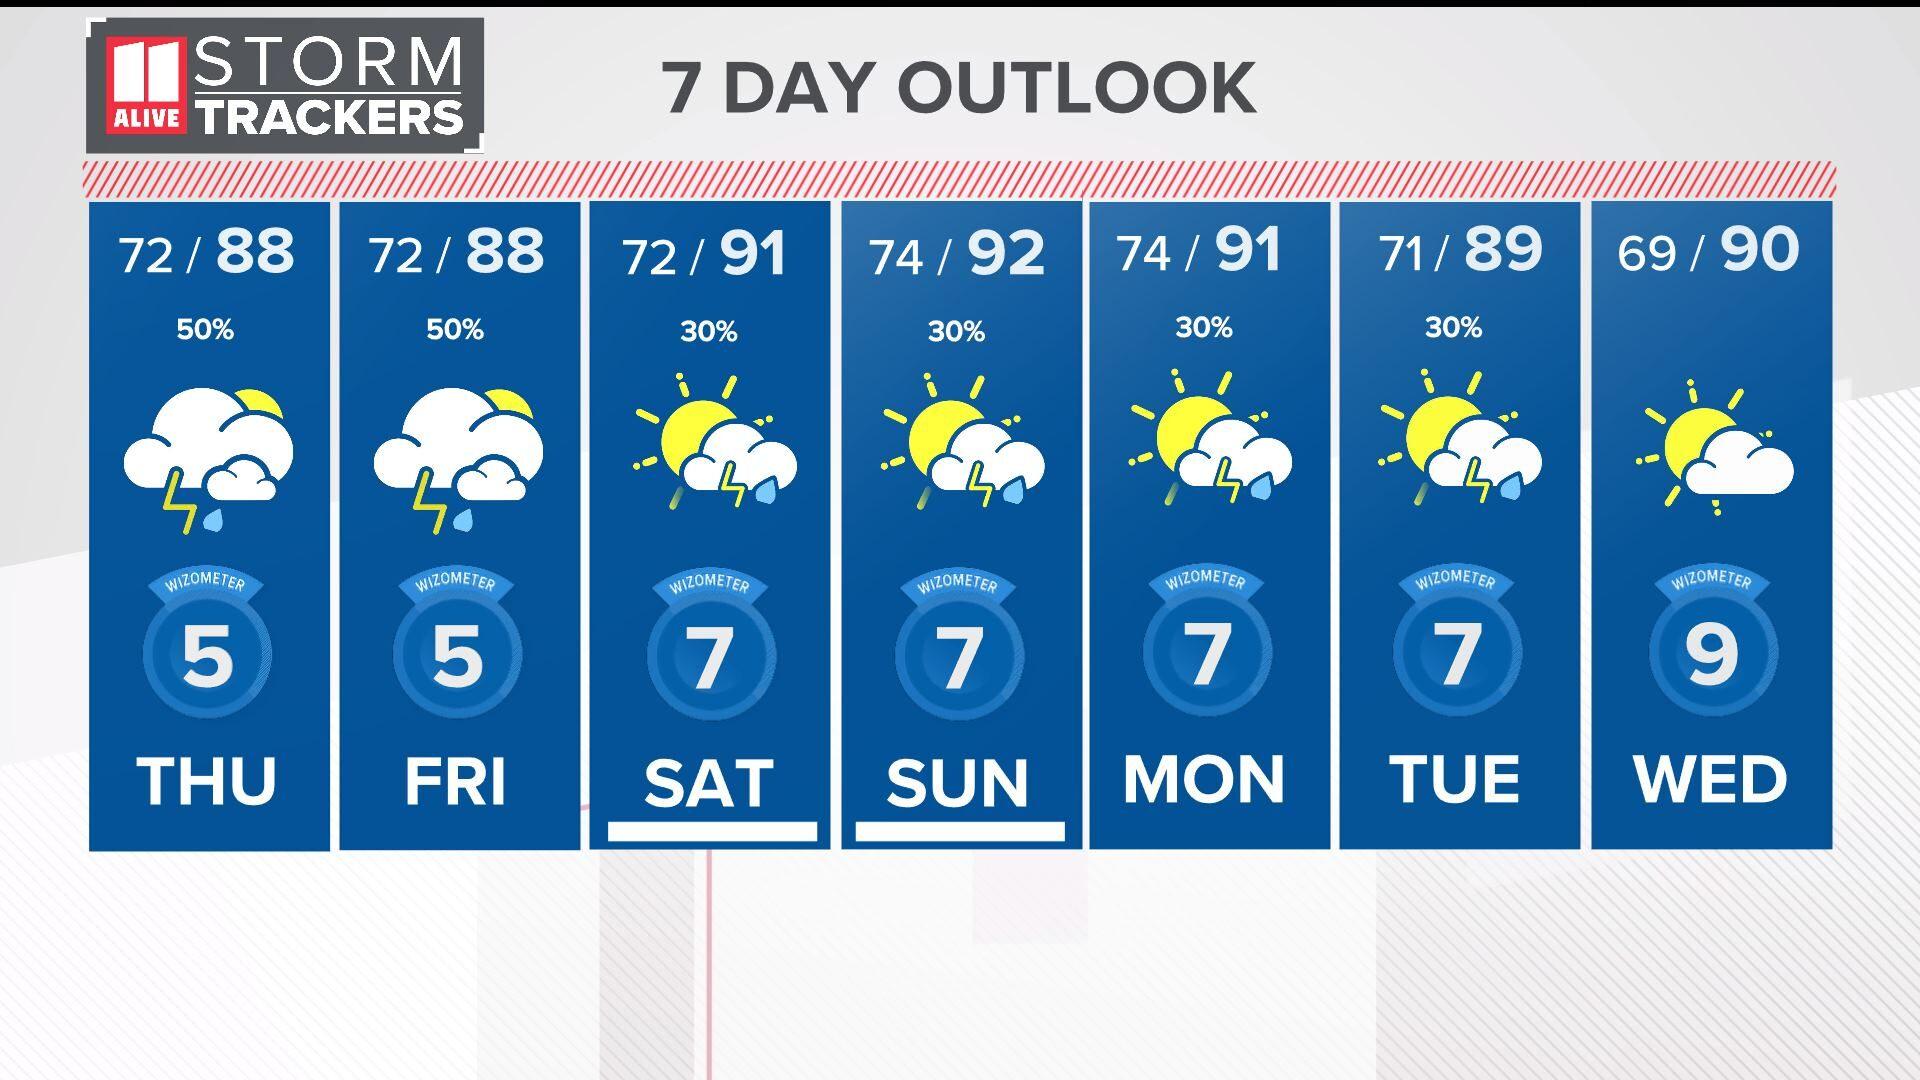 10 Day Forecast On Wxia In Atlanta